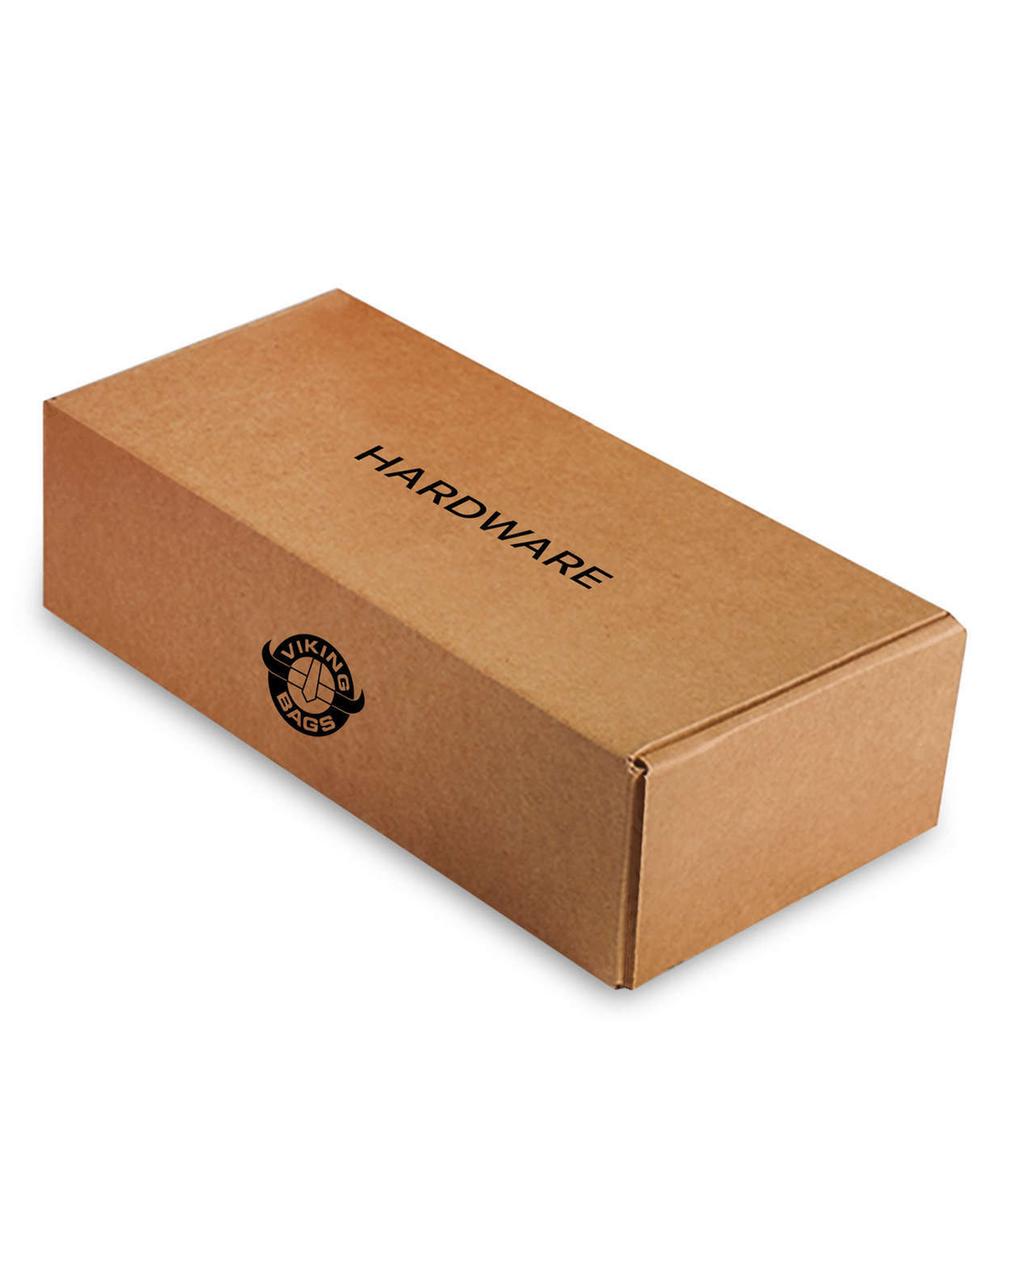 Honda VTX 1800 C Viking Lamellar Large Leather Covered Hard Saddlebags hardware box